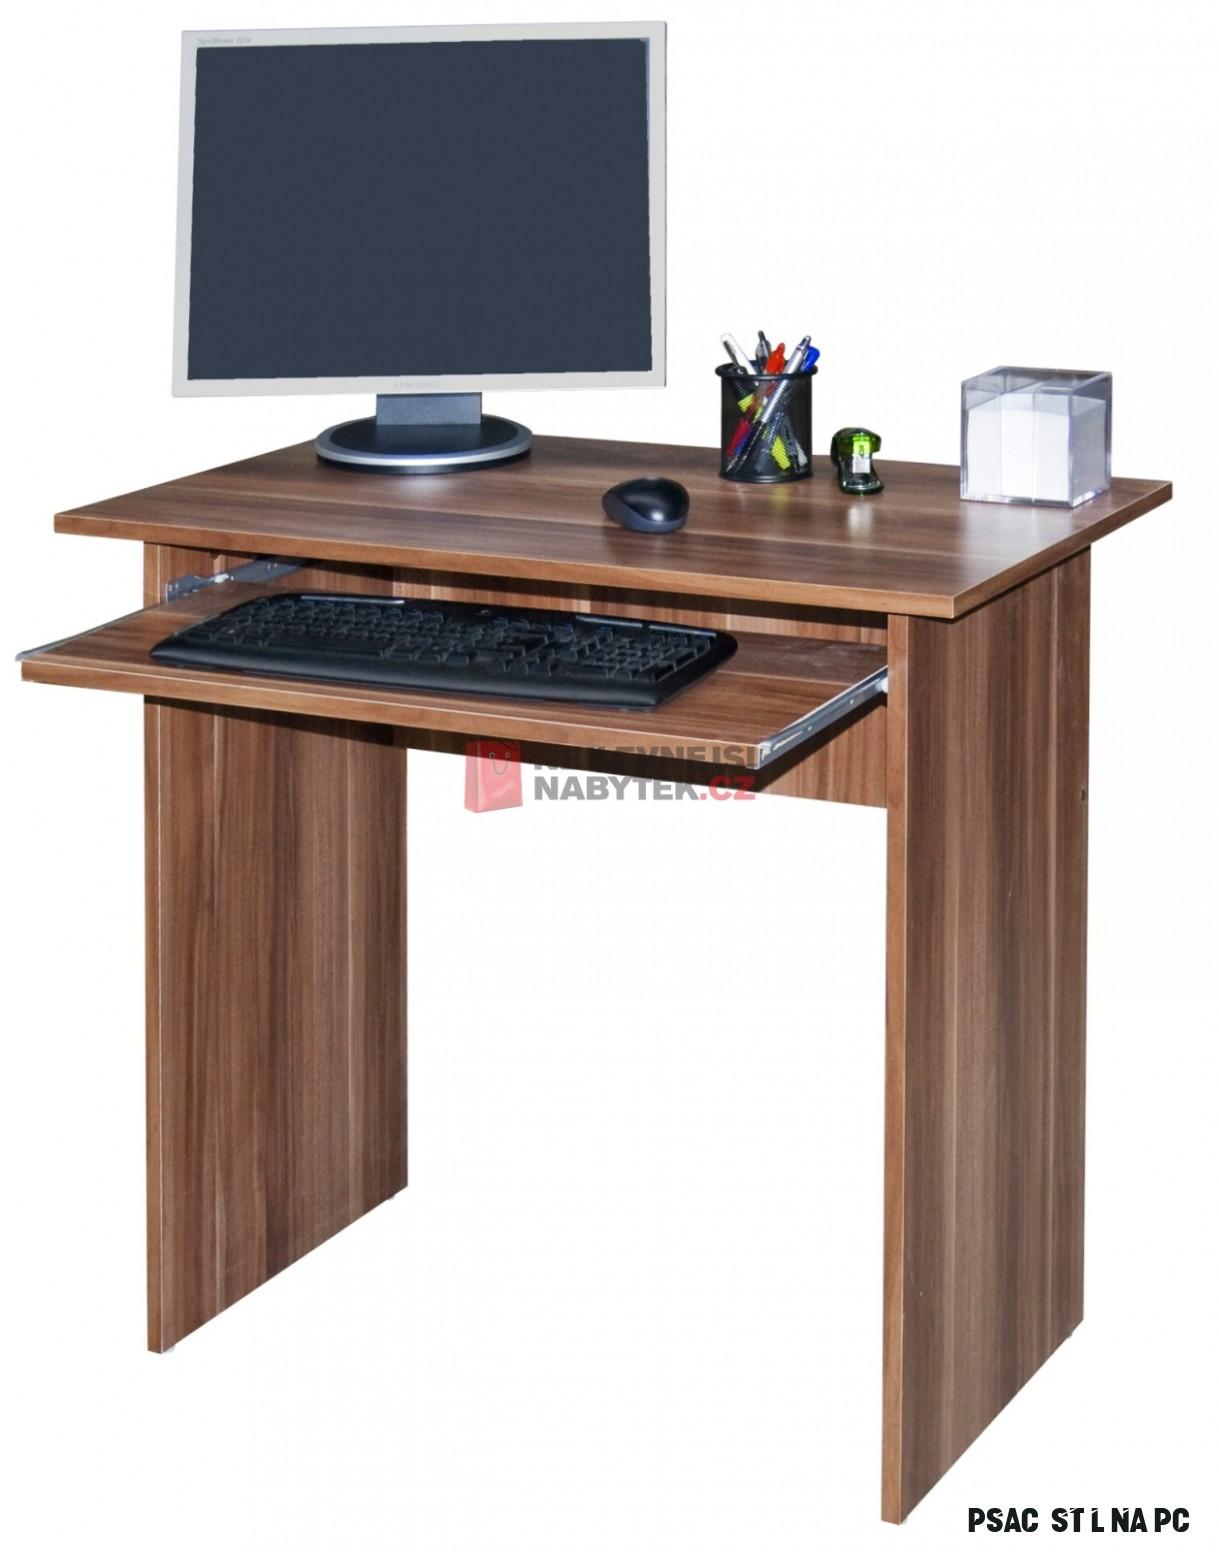 Jednoduchý PC stůl WINSTON, švestka